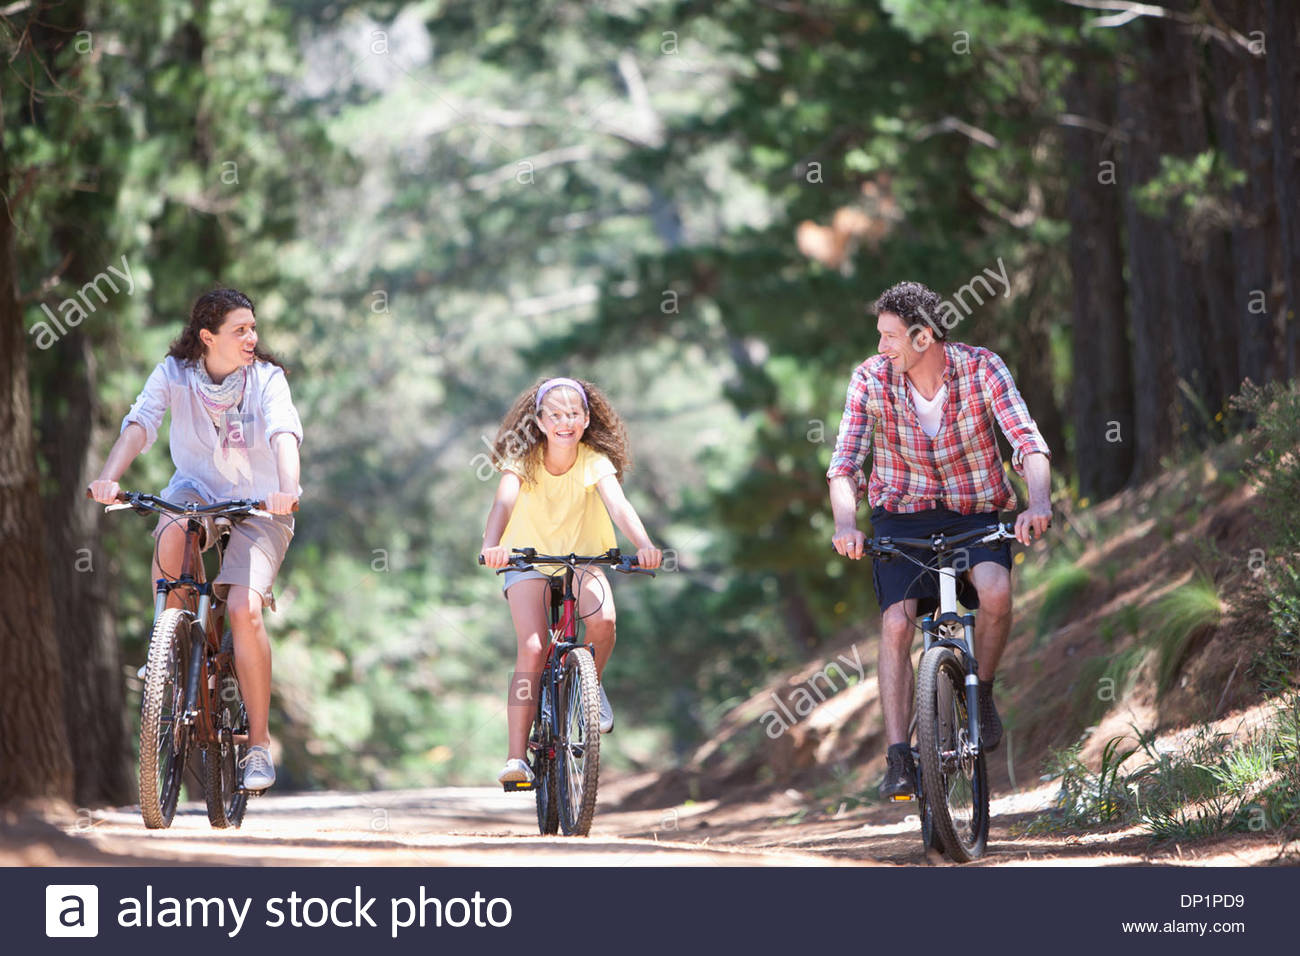 Familie Reiten Fahrräder in Wäldern Stockbild